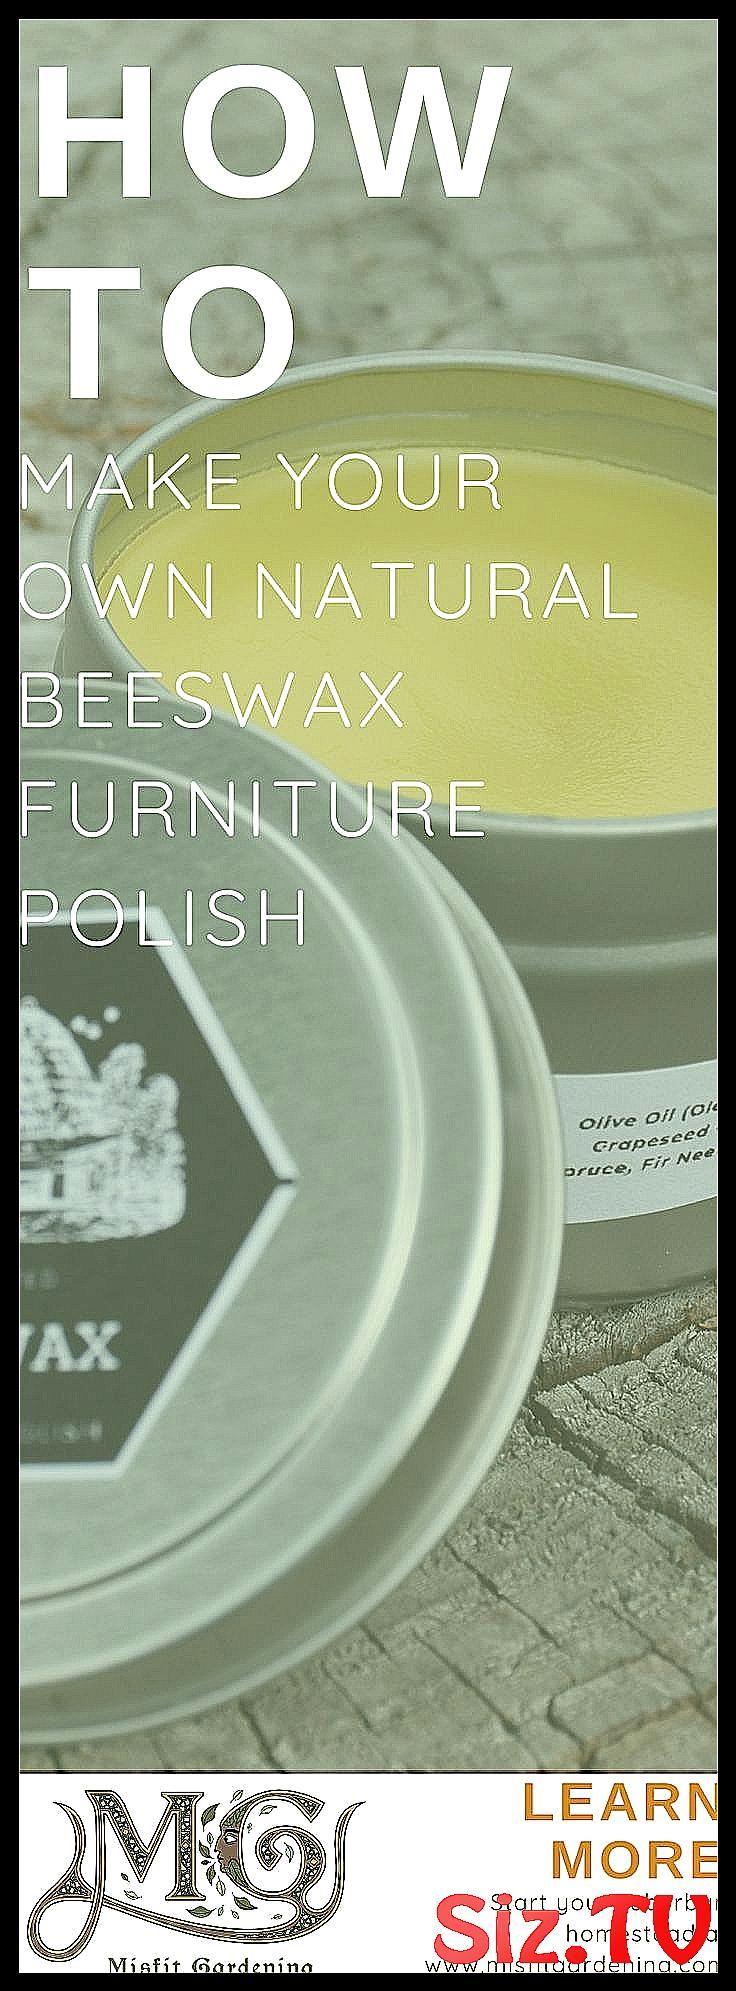 How To Make DIY Beeswax Furnishings Polish How To Make DIY Beeswax Furnishings Polish How To Make DIY Be…